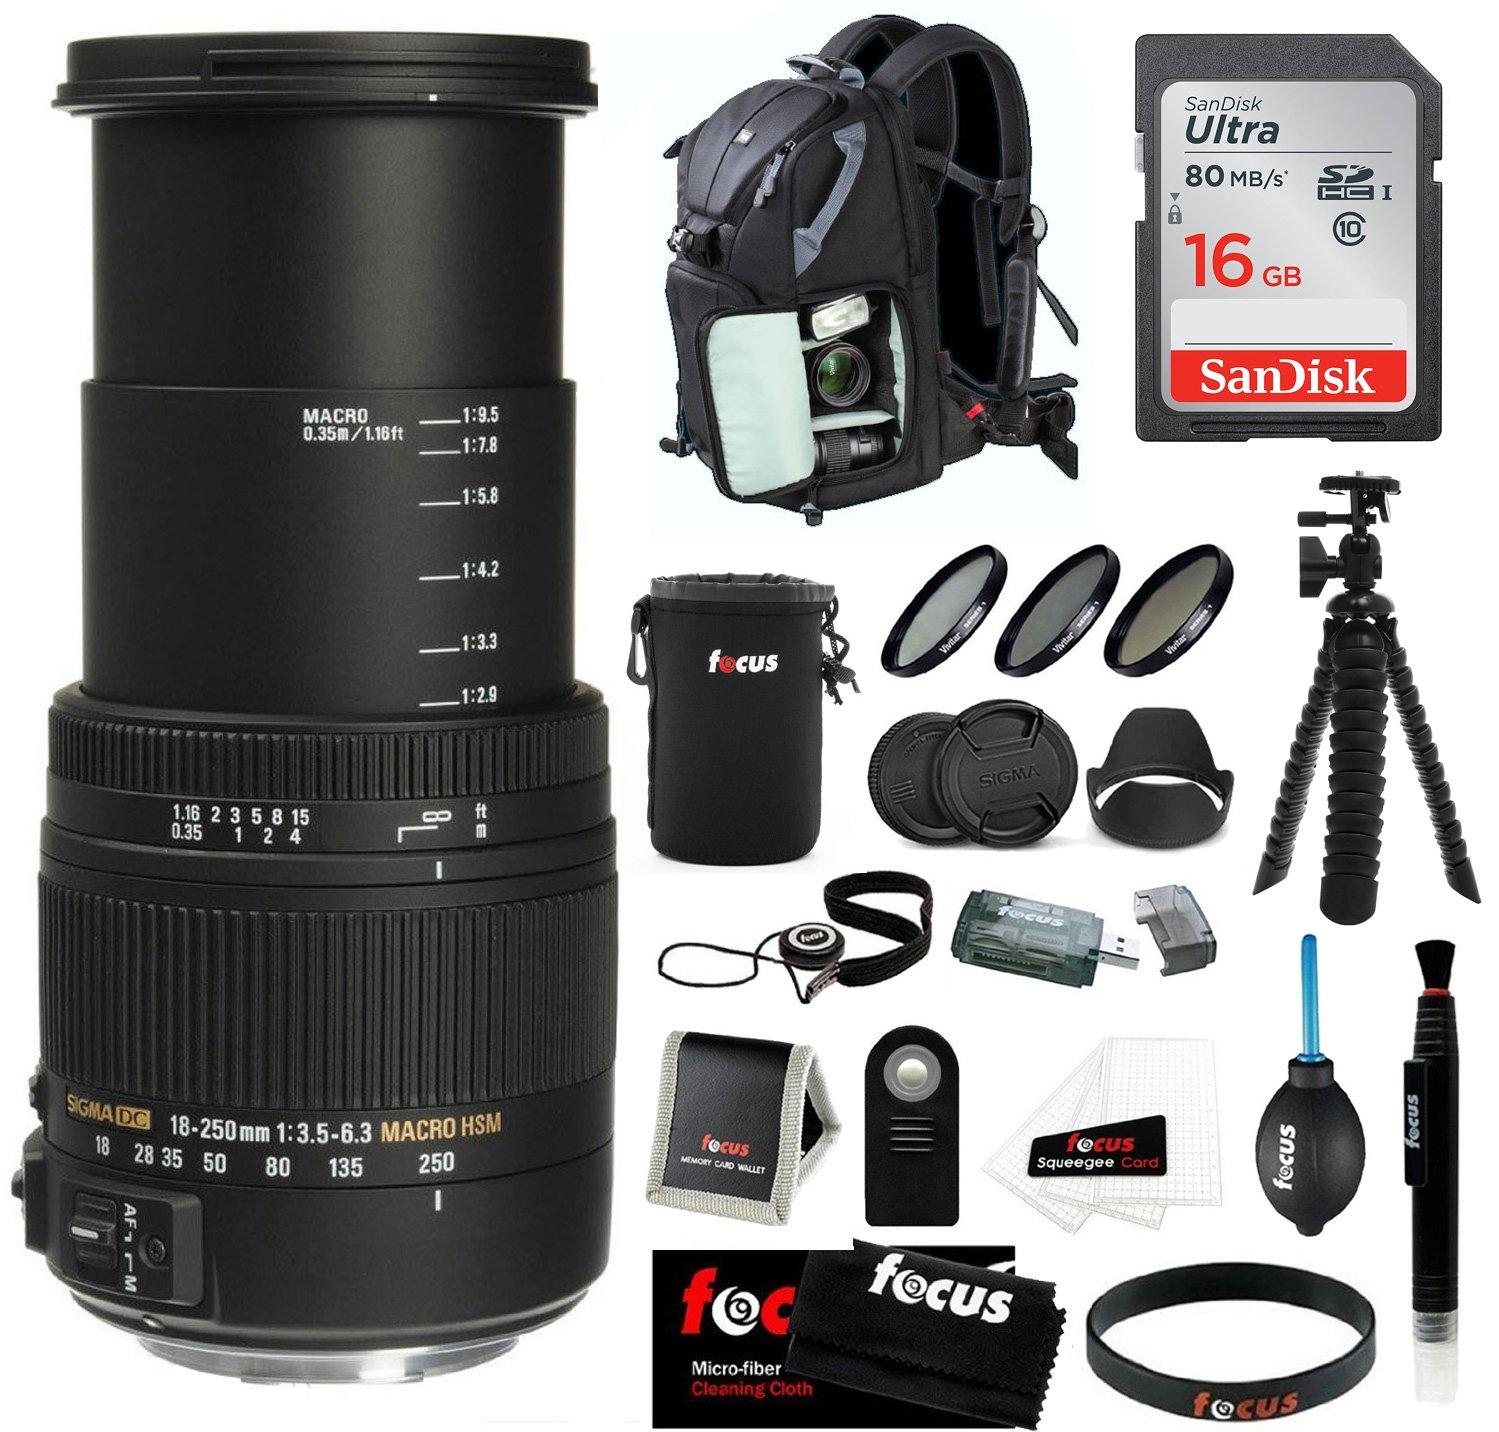 Sigma 18 – 250 mm f / 3.5 – 6.3 DC OS HSMマクロレンズfor Nikon W / 16 GB SDカードバンドル   B0184IG1H0